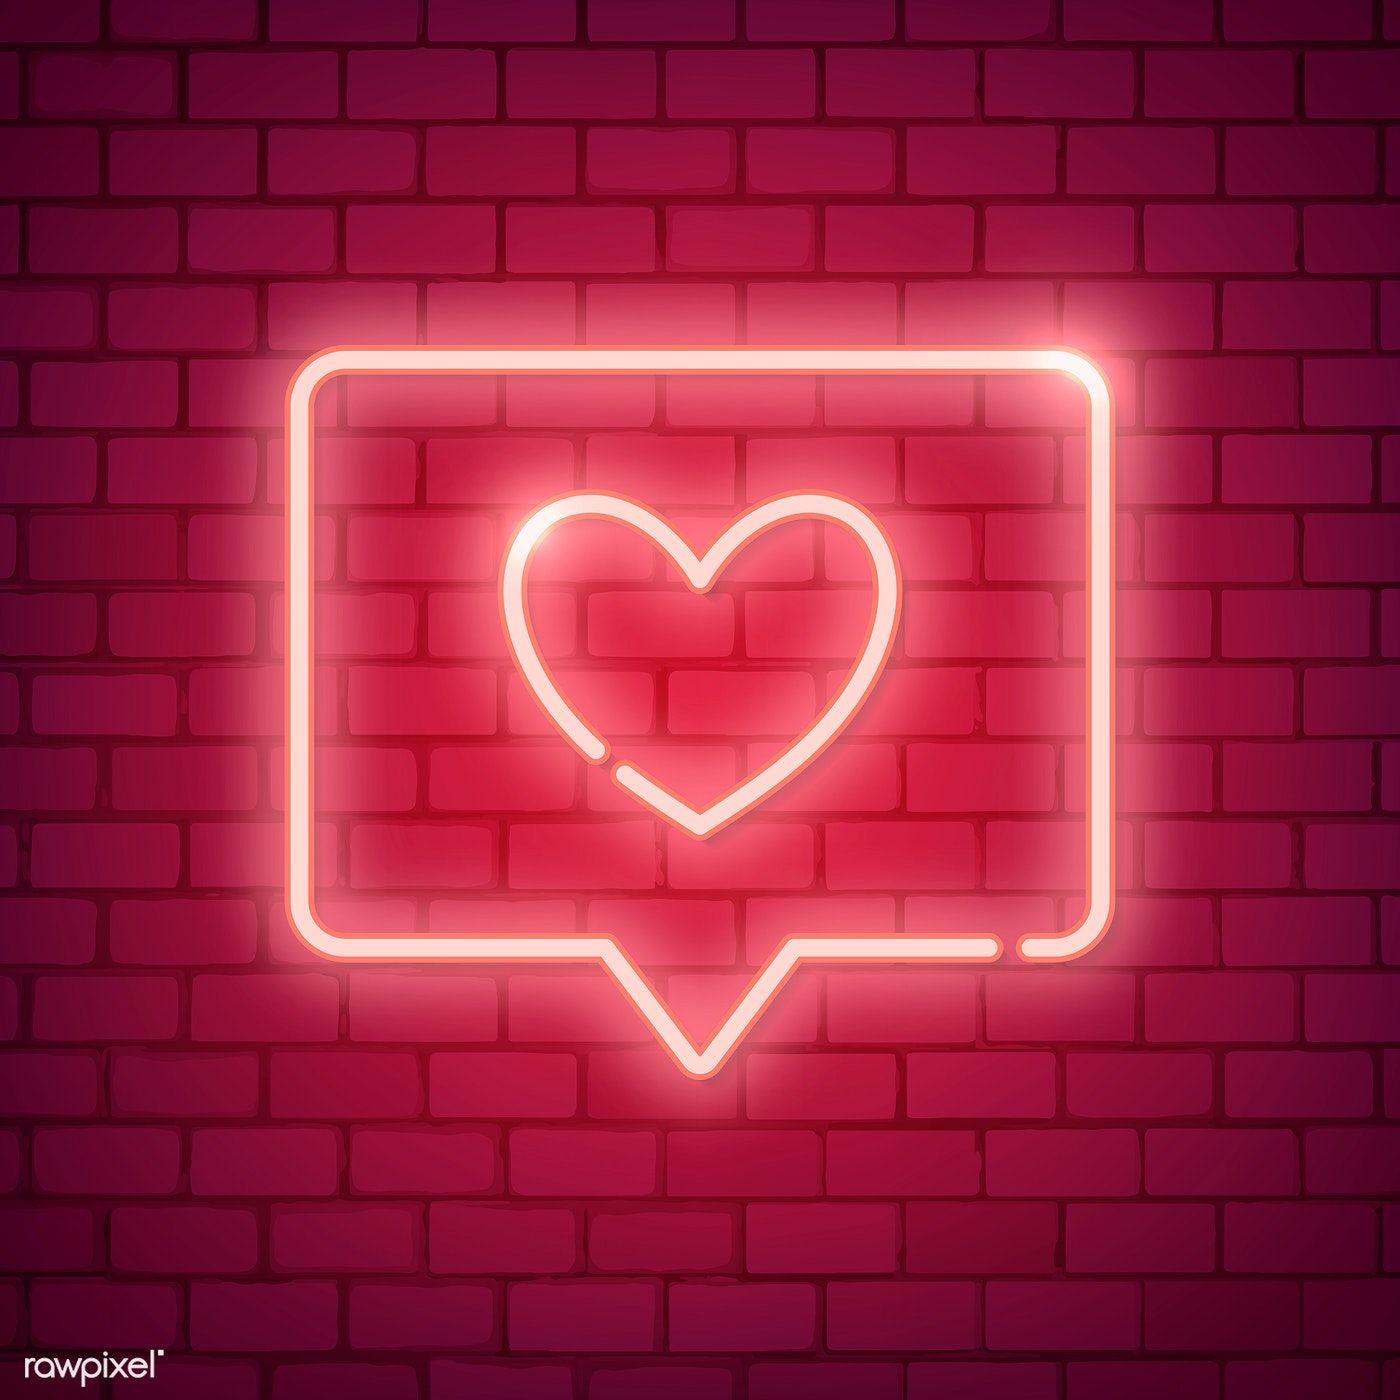 Neon light Valentine's day symbol on brick wall free